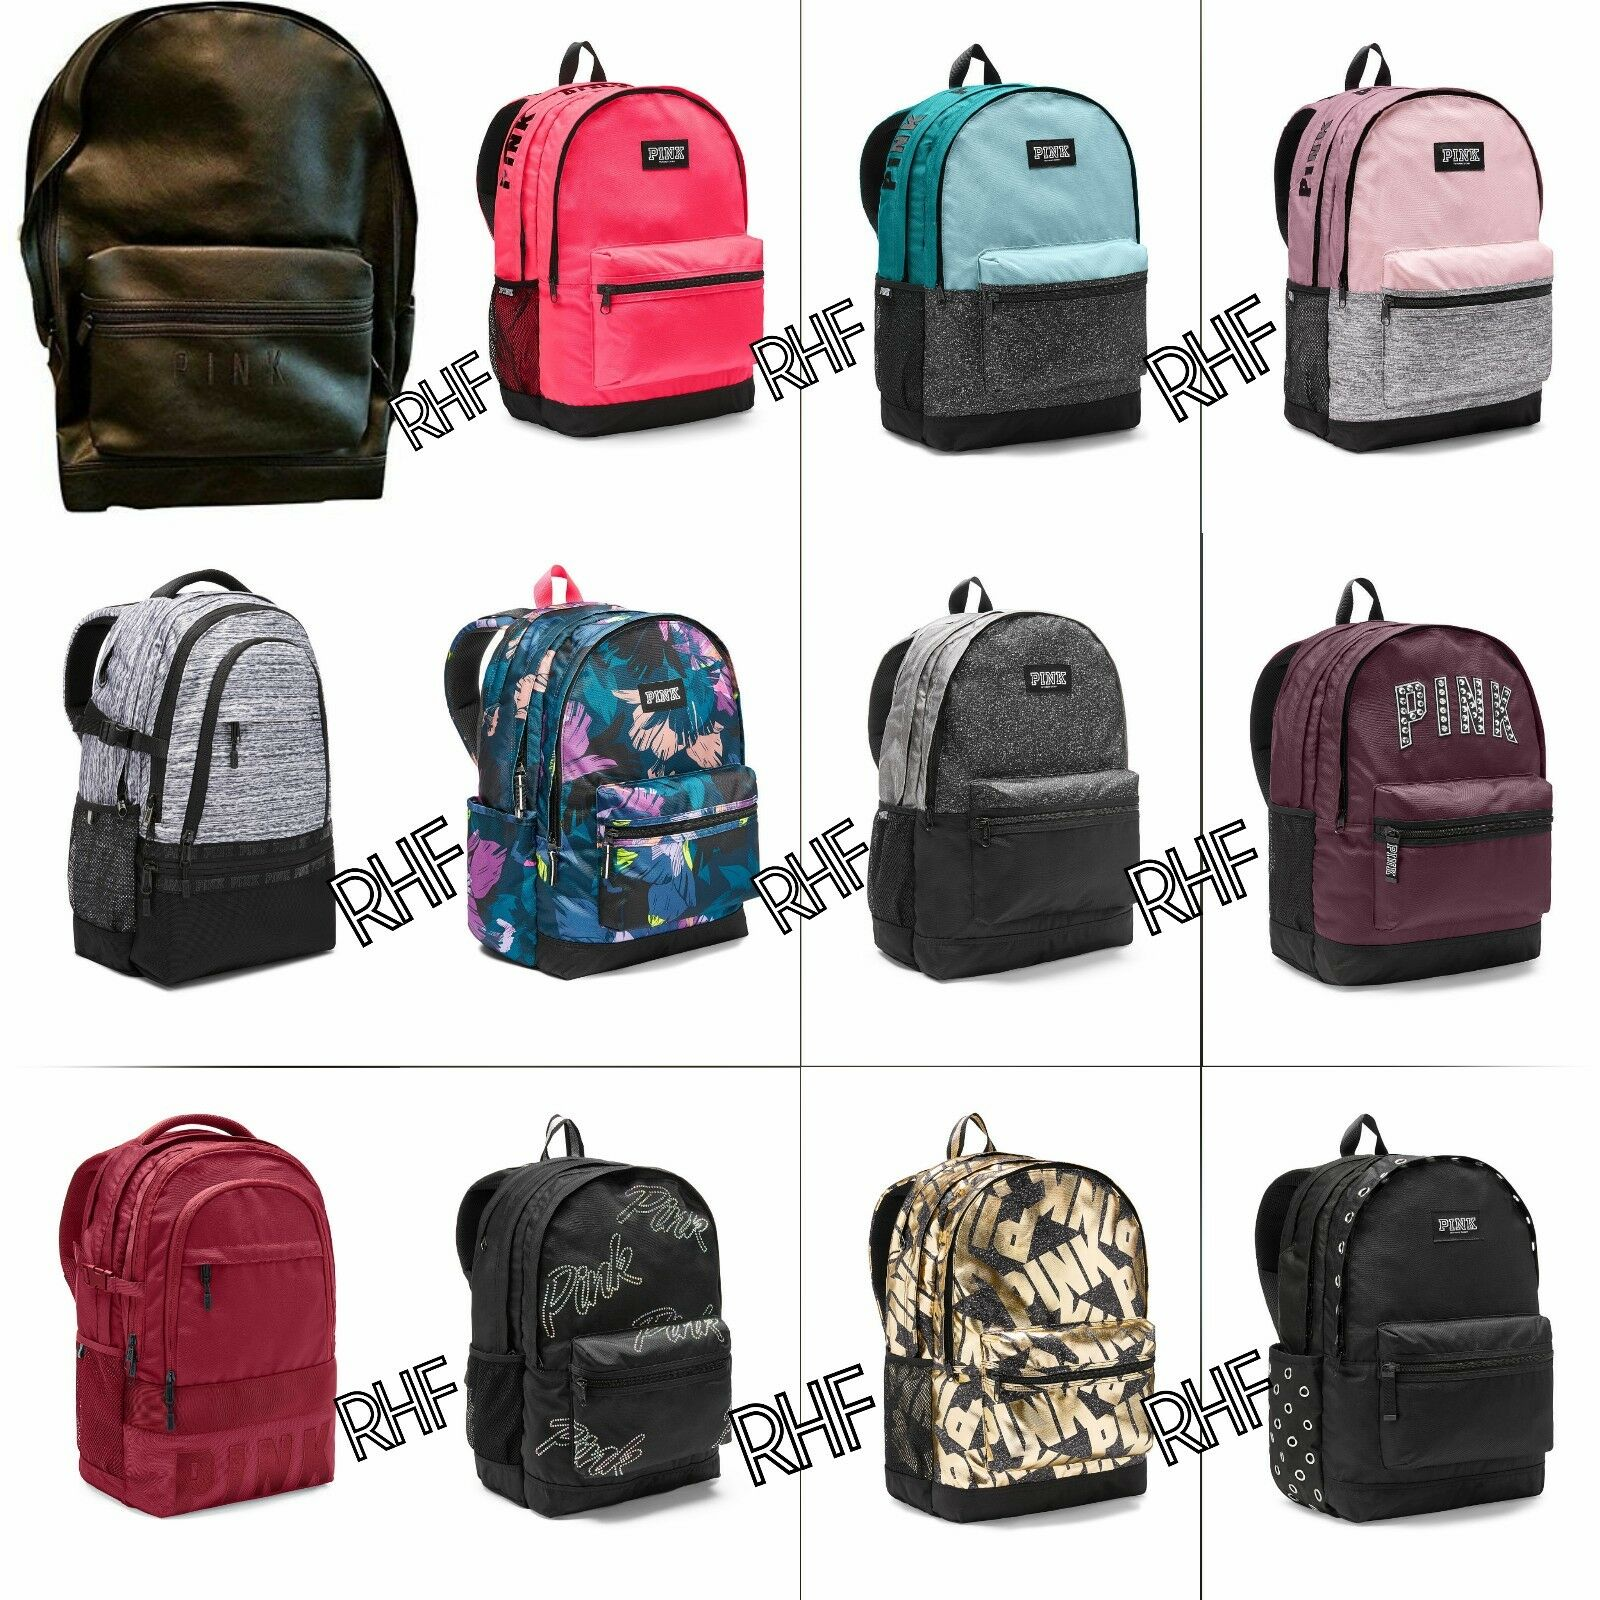 Victoria's Secret PINK Campus and Collegiate Backpack Book-b